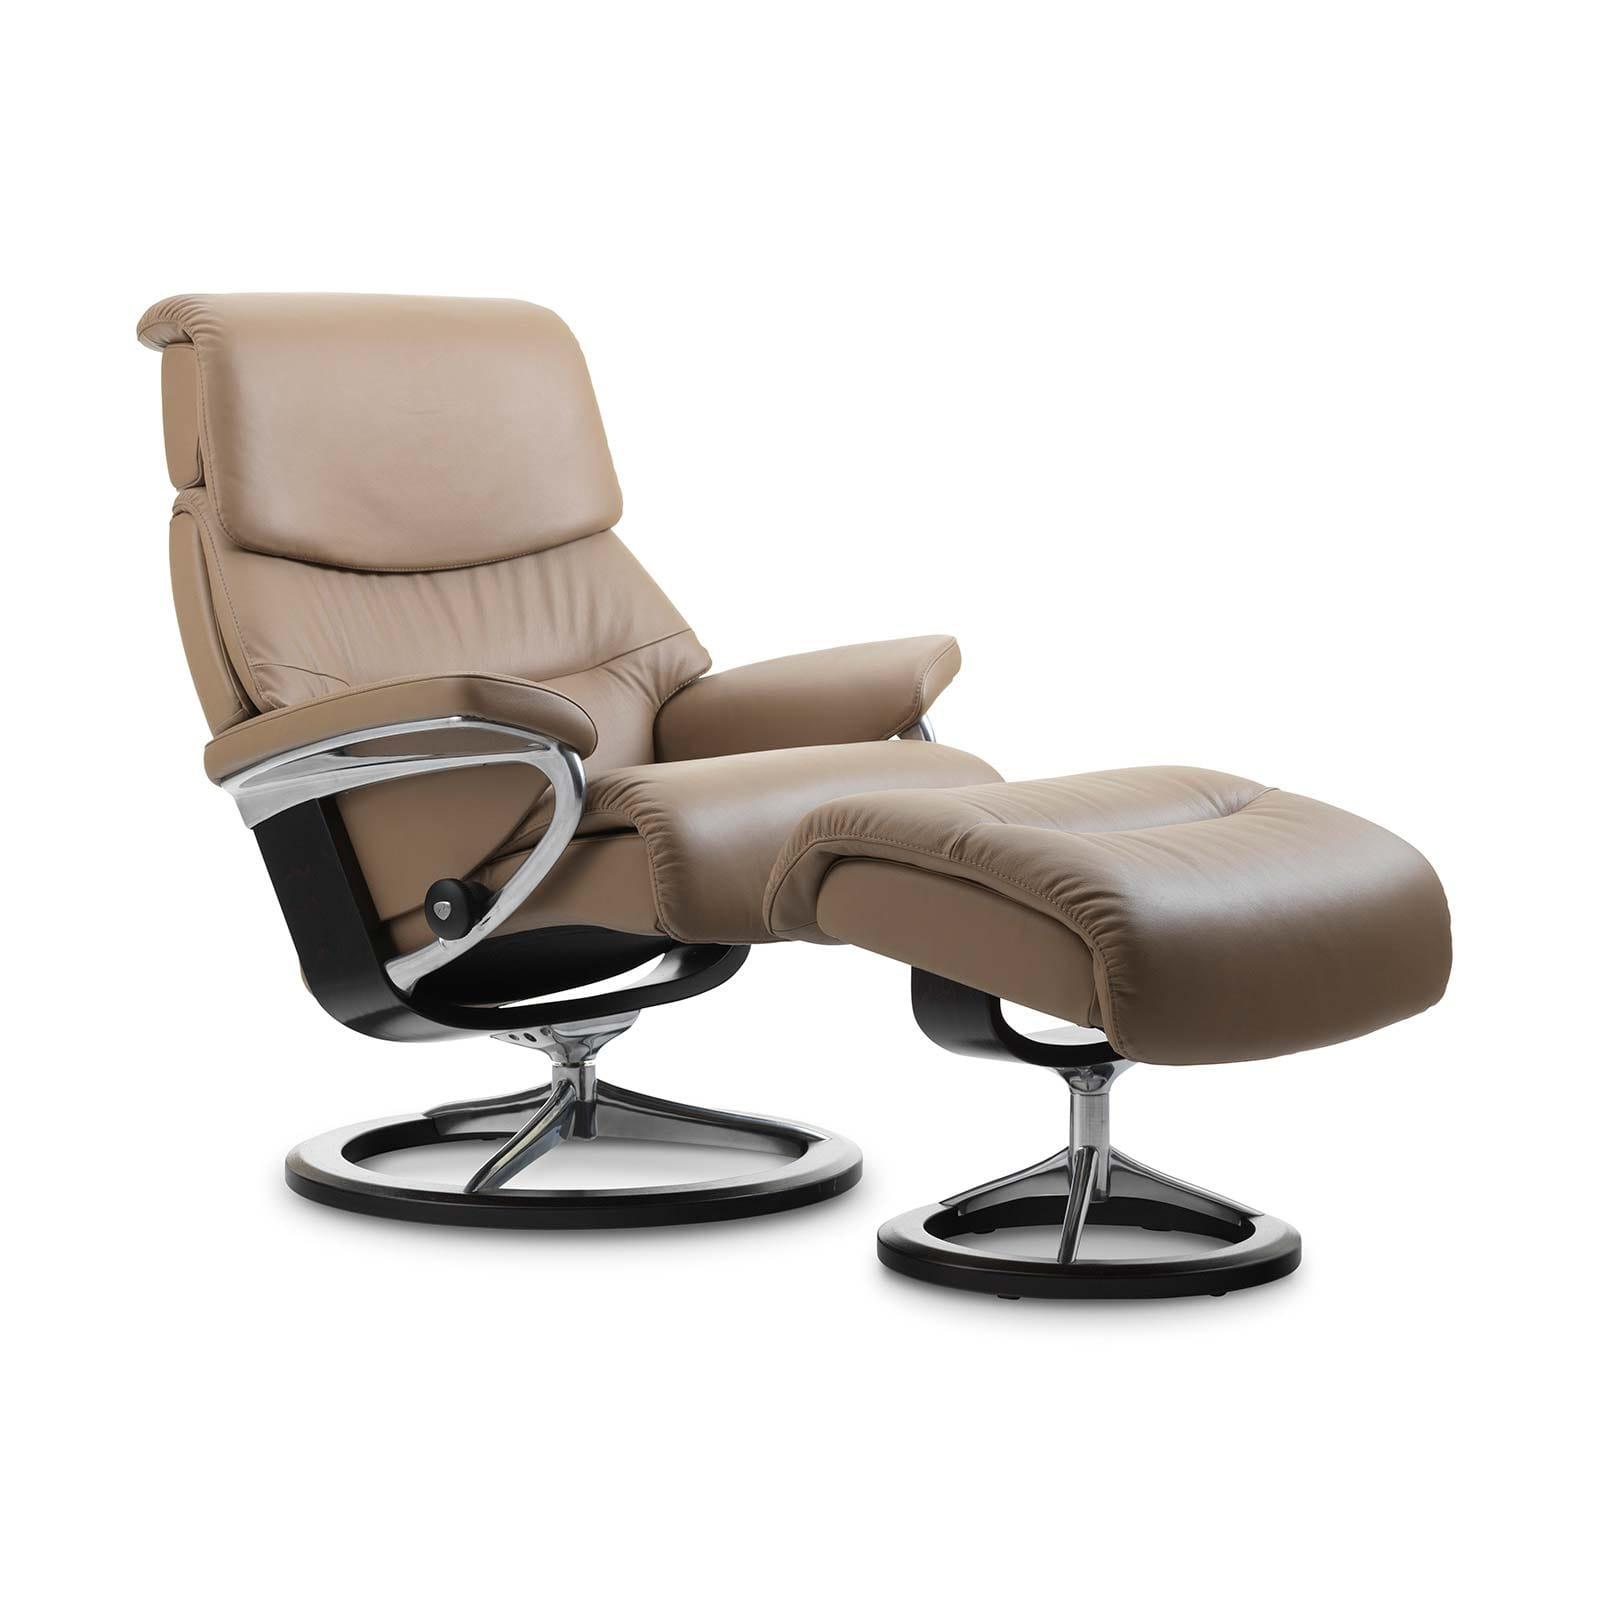 stressless capri s paloma funghi ohne hocker house of comfort. Black Bedroom Furniture Sets. Home Design Ideas